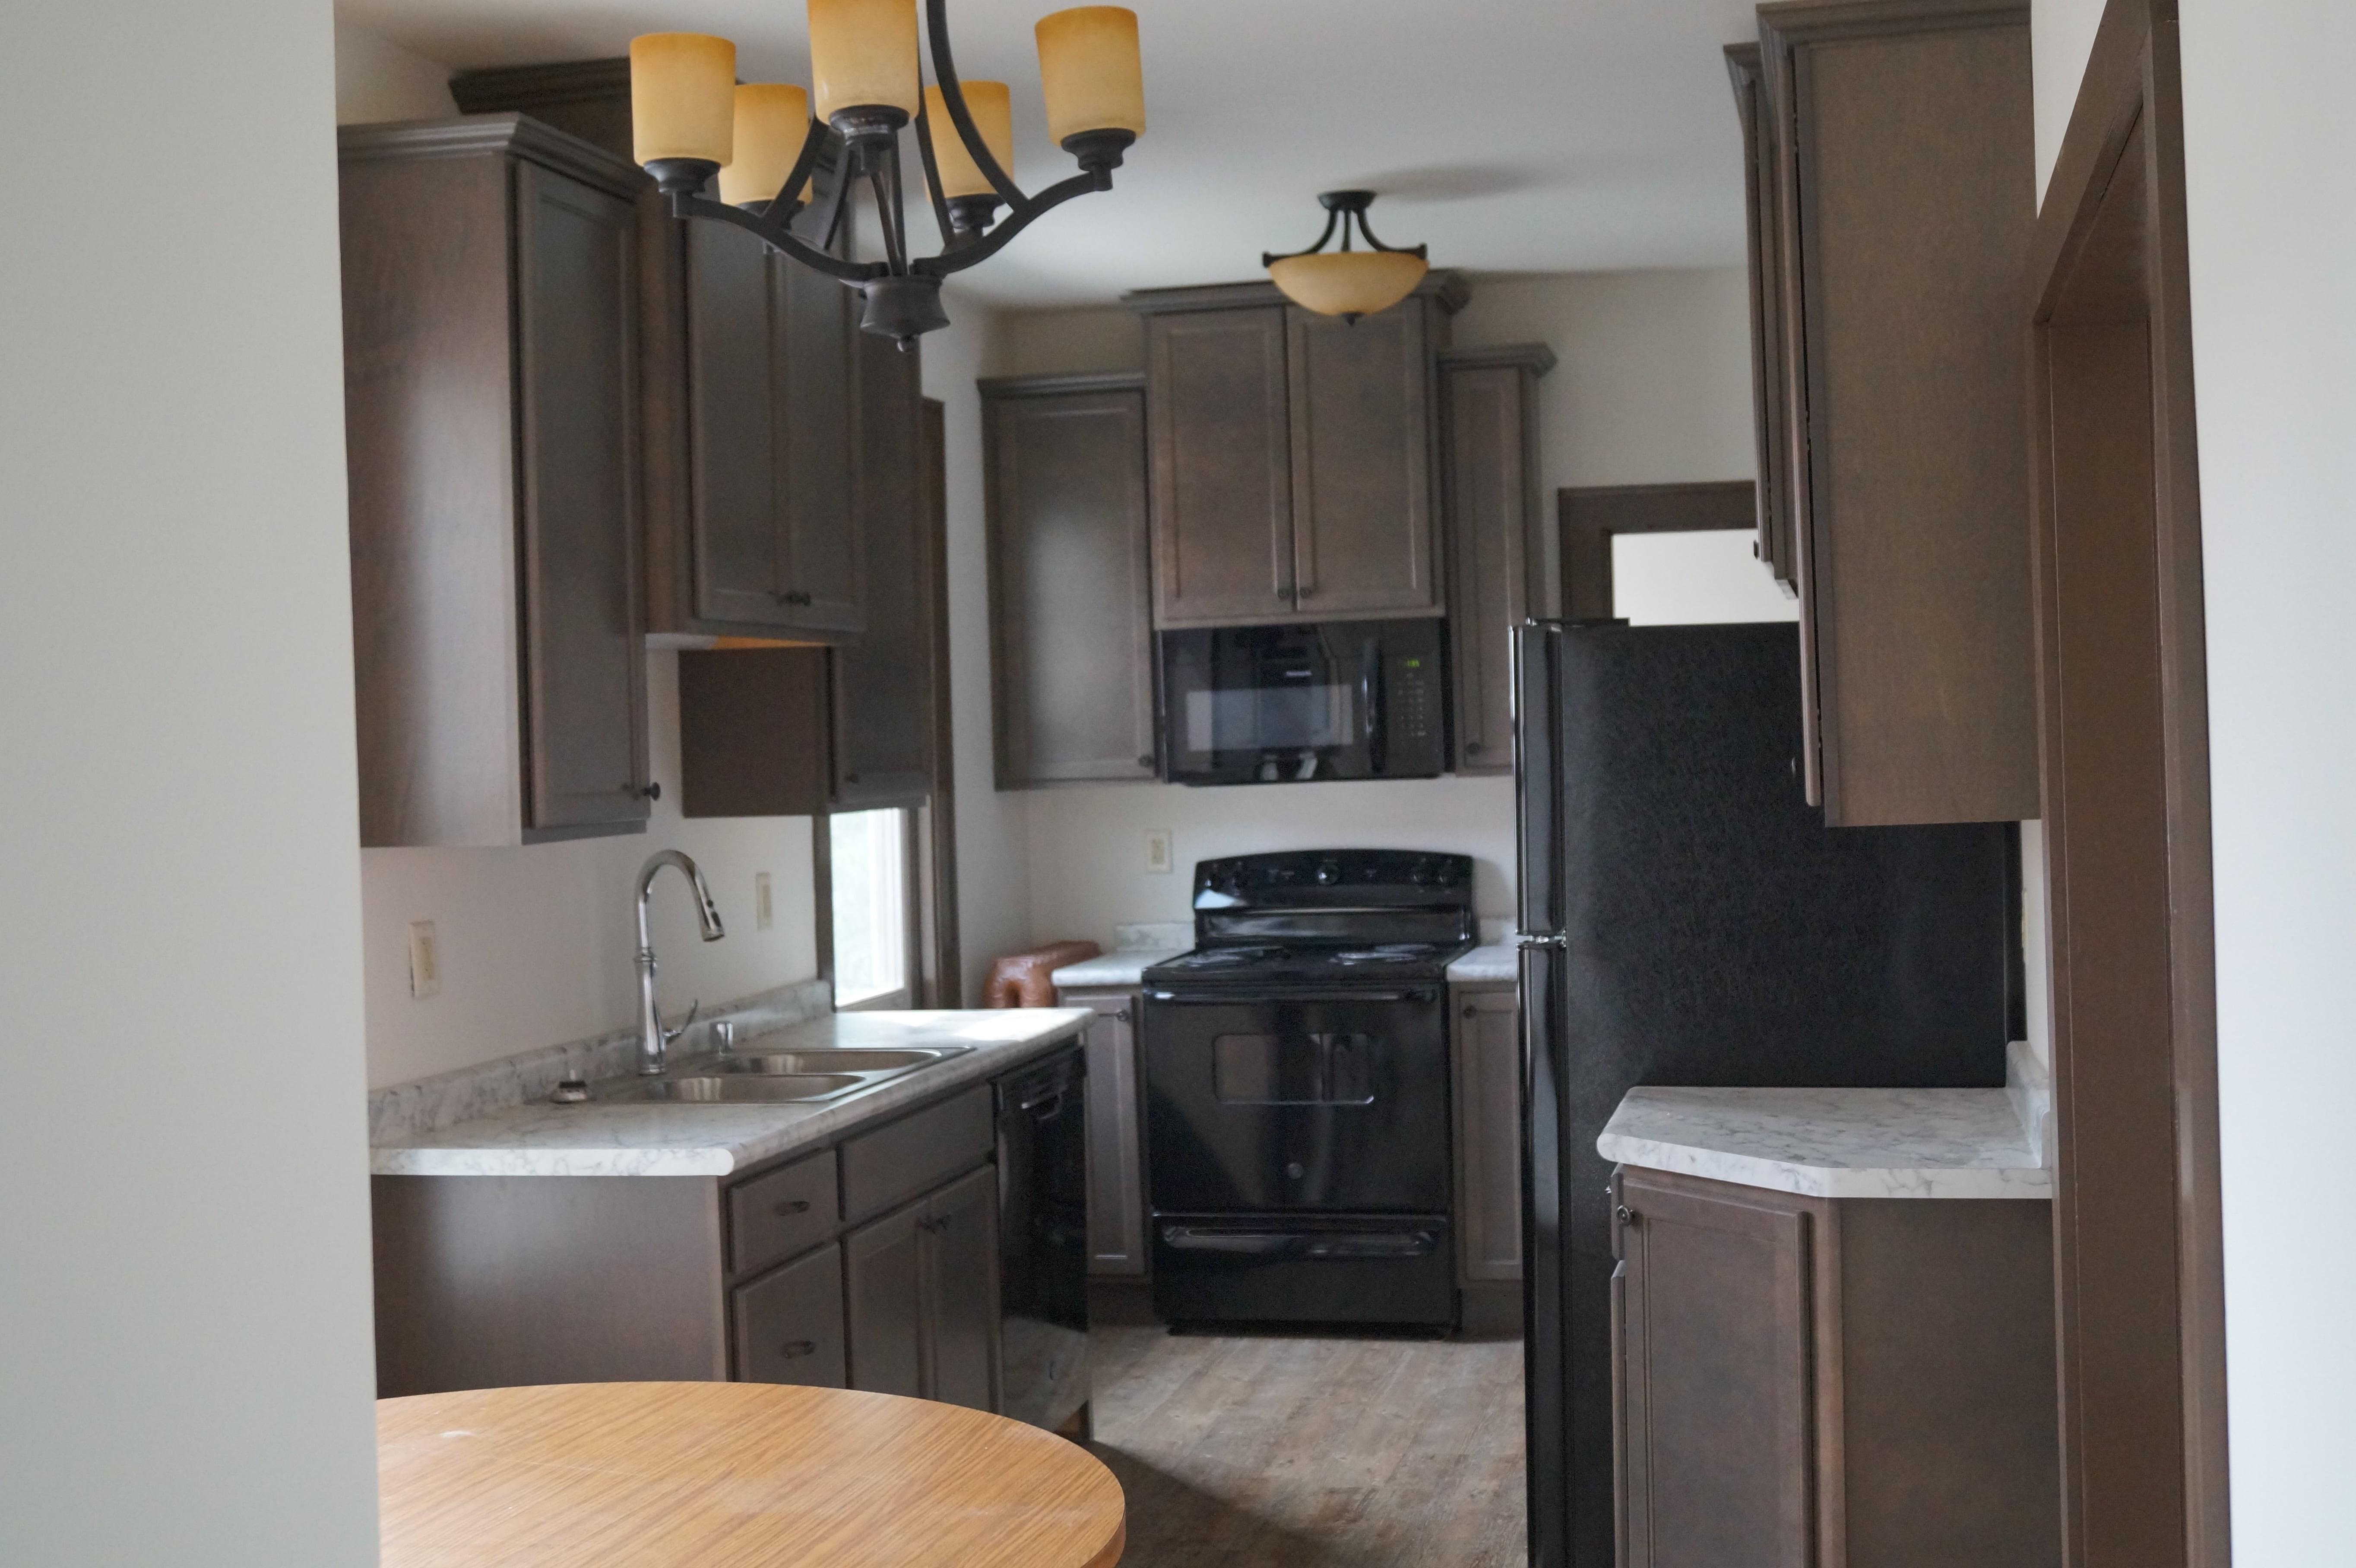 Apartments Near UW-Platteville Lanridge Apartments for University of Wisconsin-Platteville Students in Platteville, WI